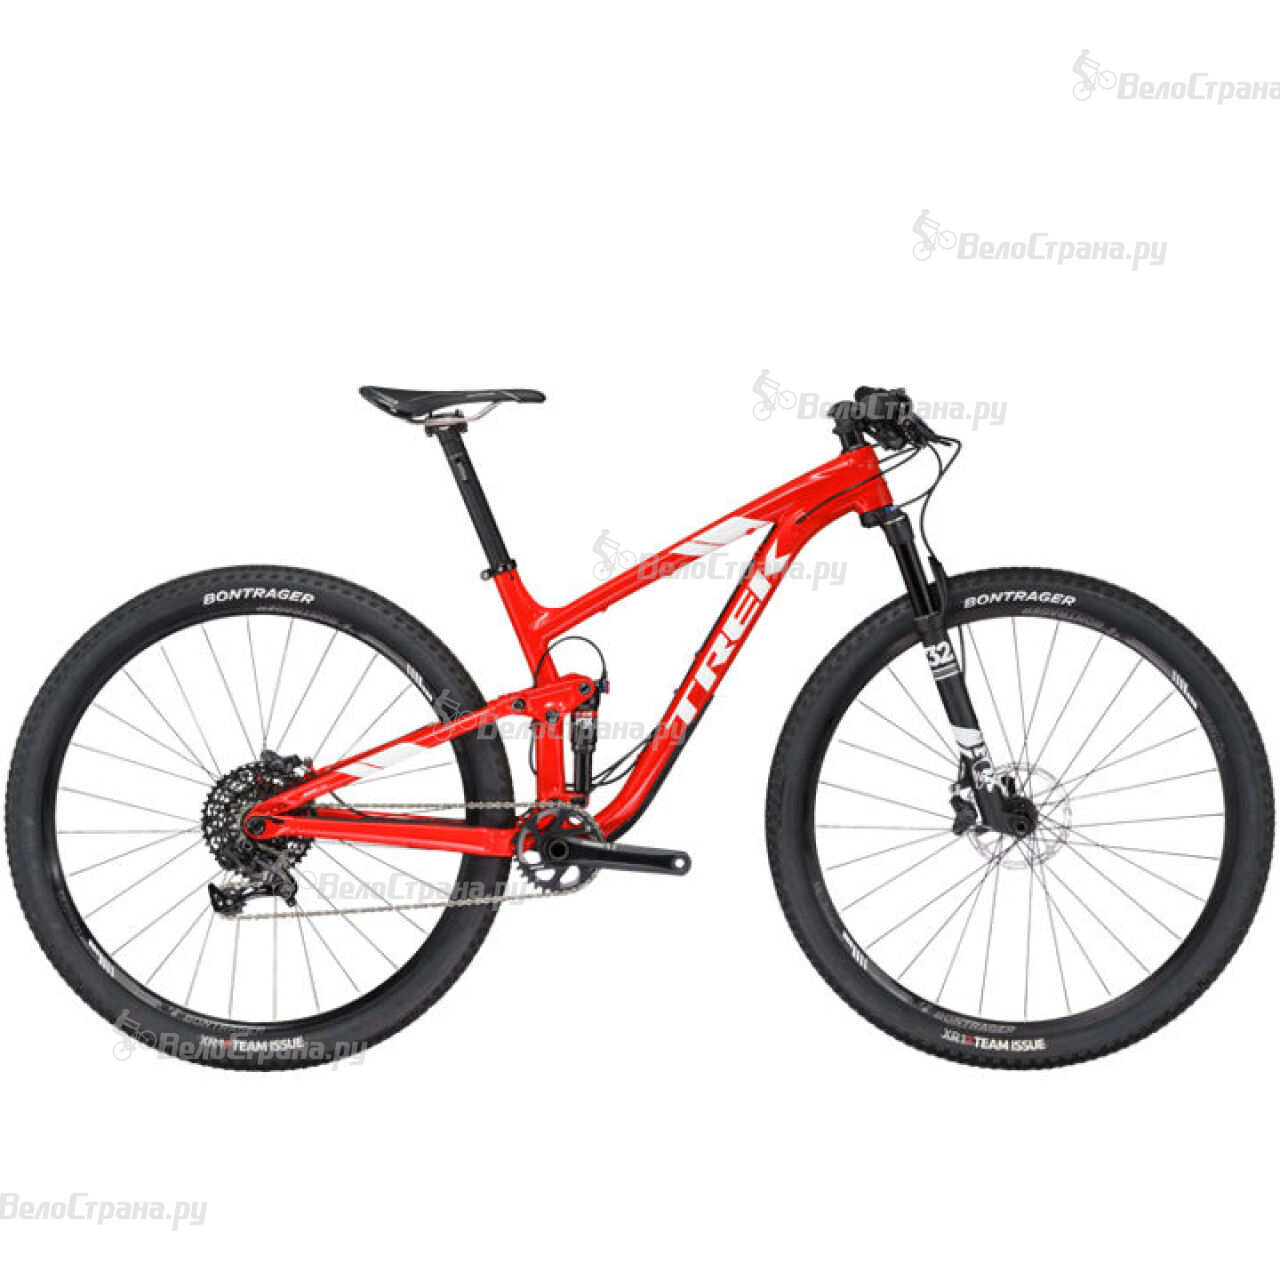 Велосипед Trek Top Fuel 9 (2017) trek fuel ex 9 27 5